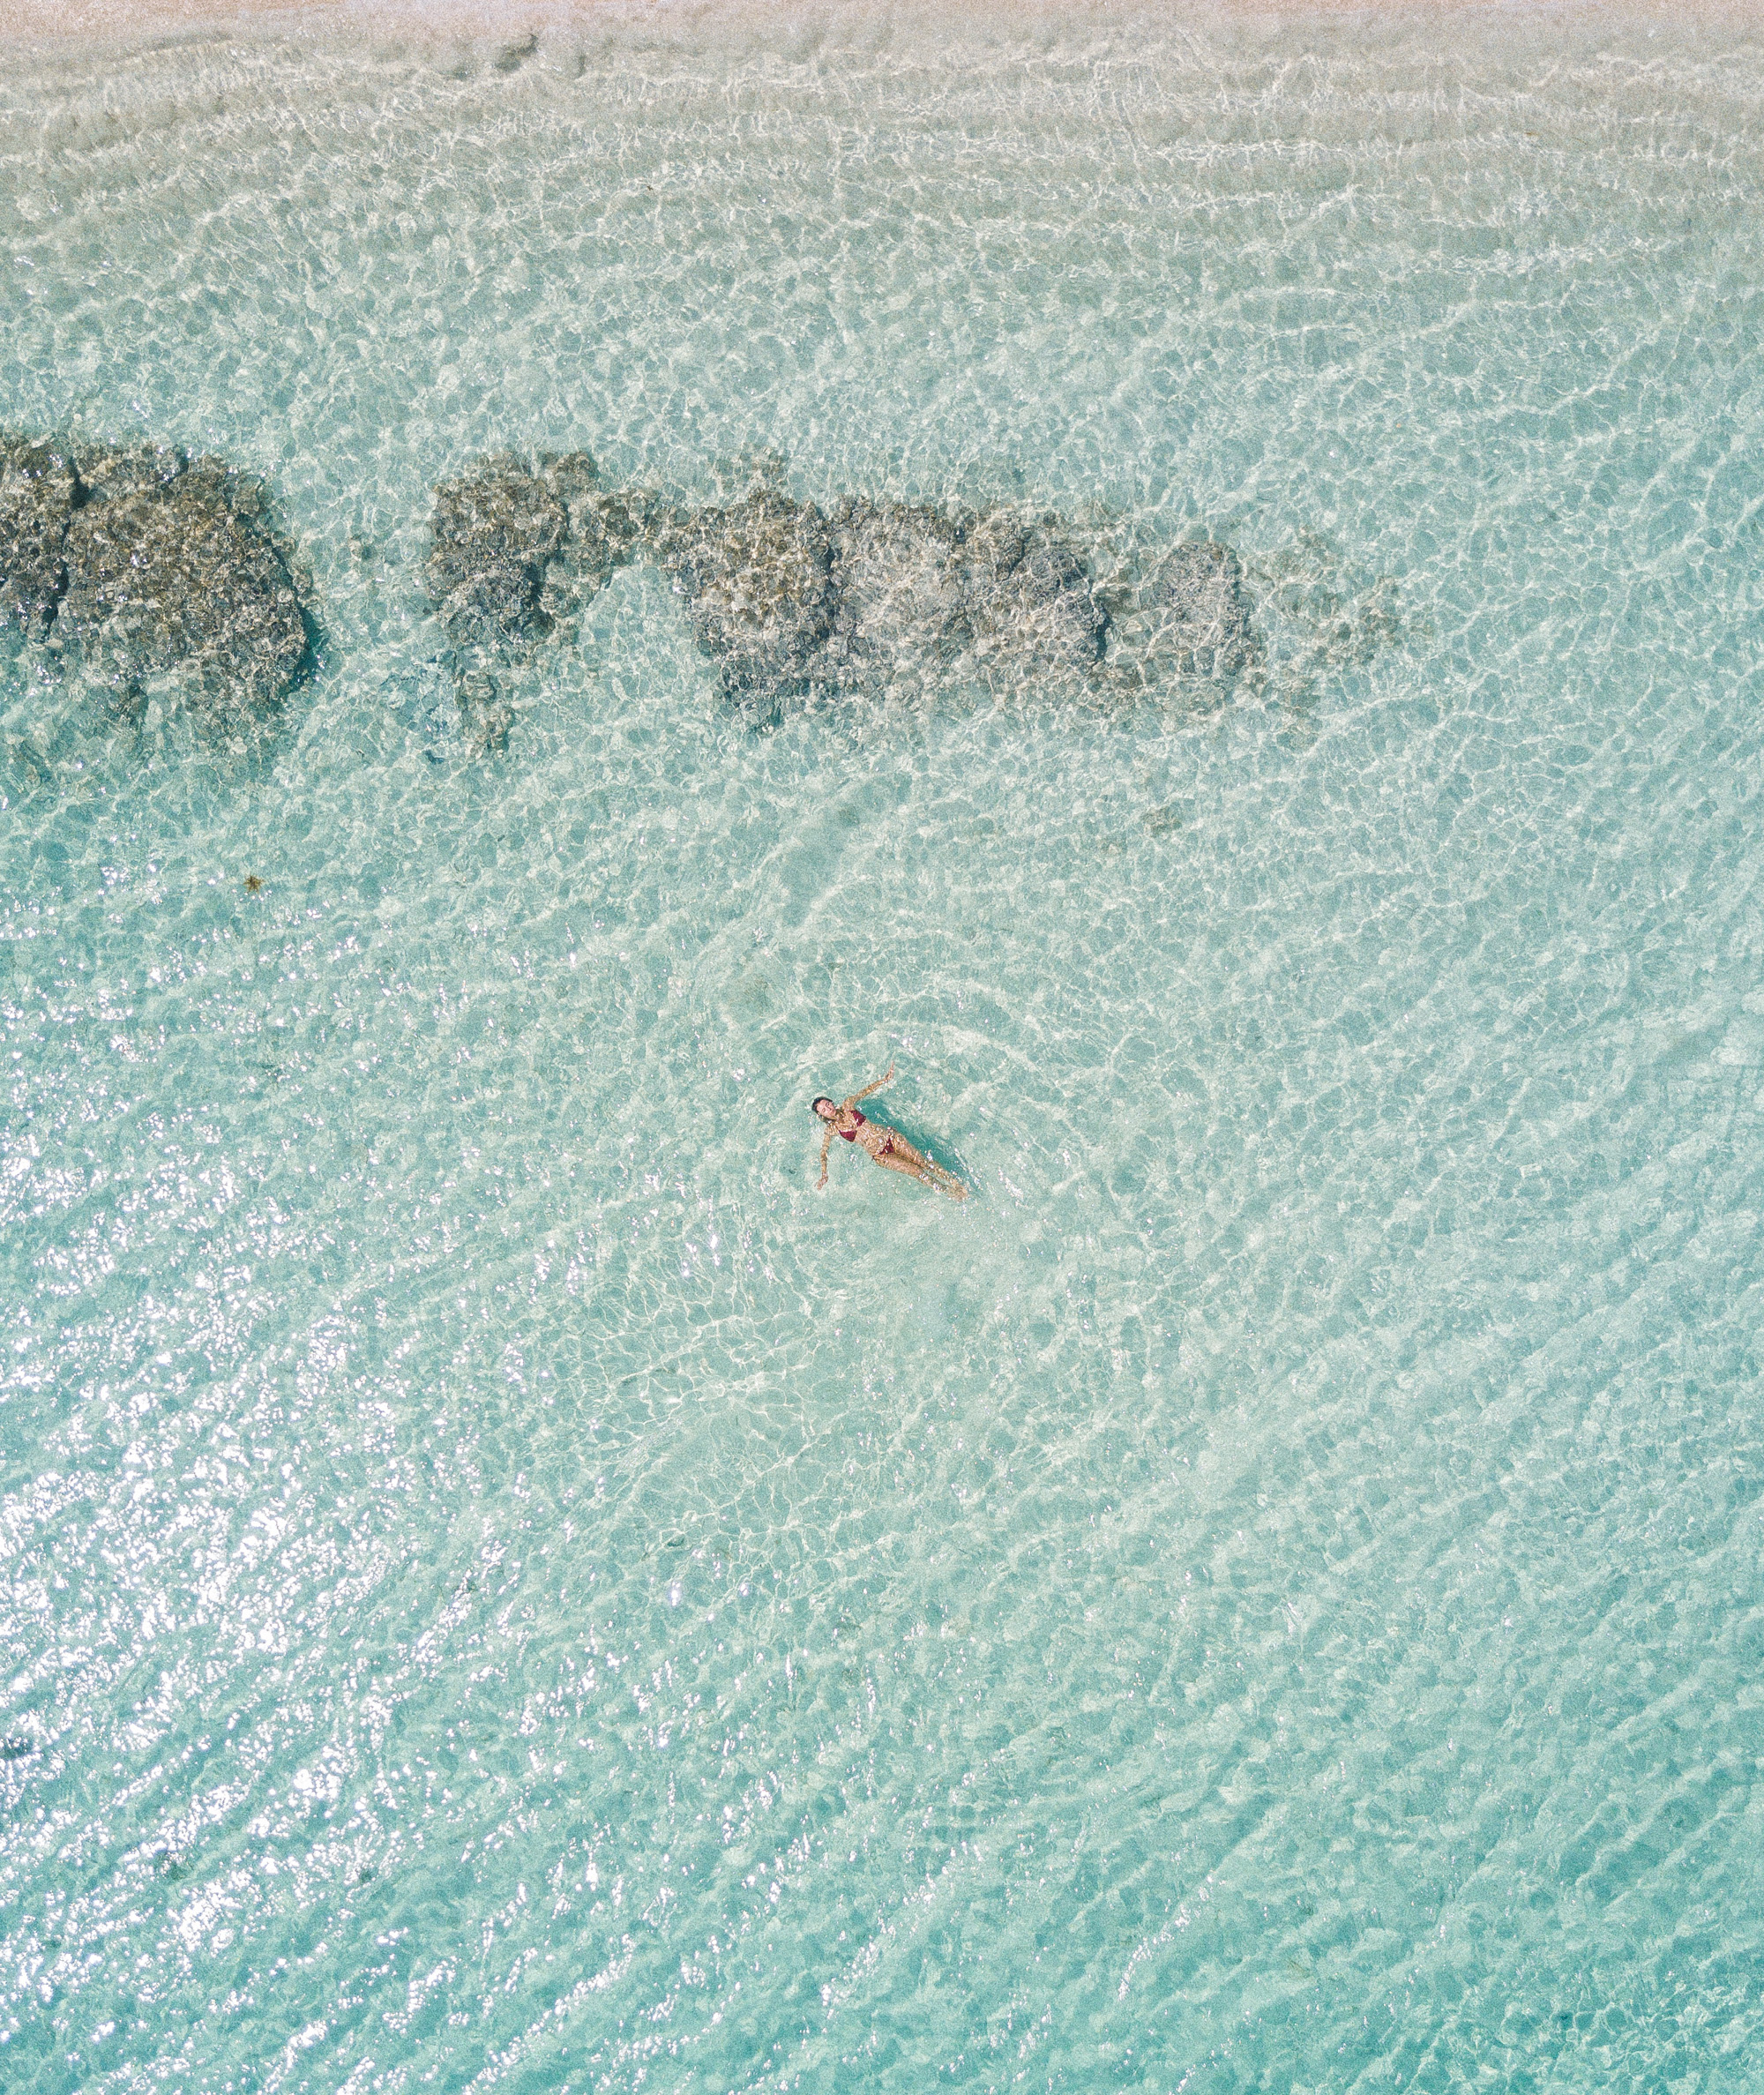 Clear blue water, Saona Island, Dominican Republic | Clear Blue Water in Punta Cana | Tropical Paradise Beach Getaways in the Caribbean | Islands Near North America